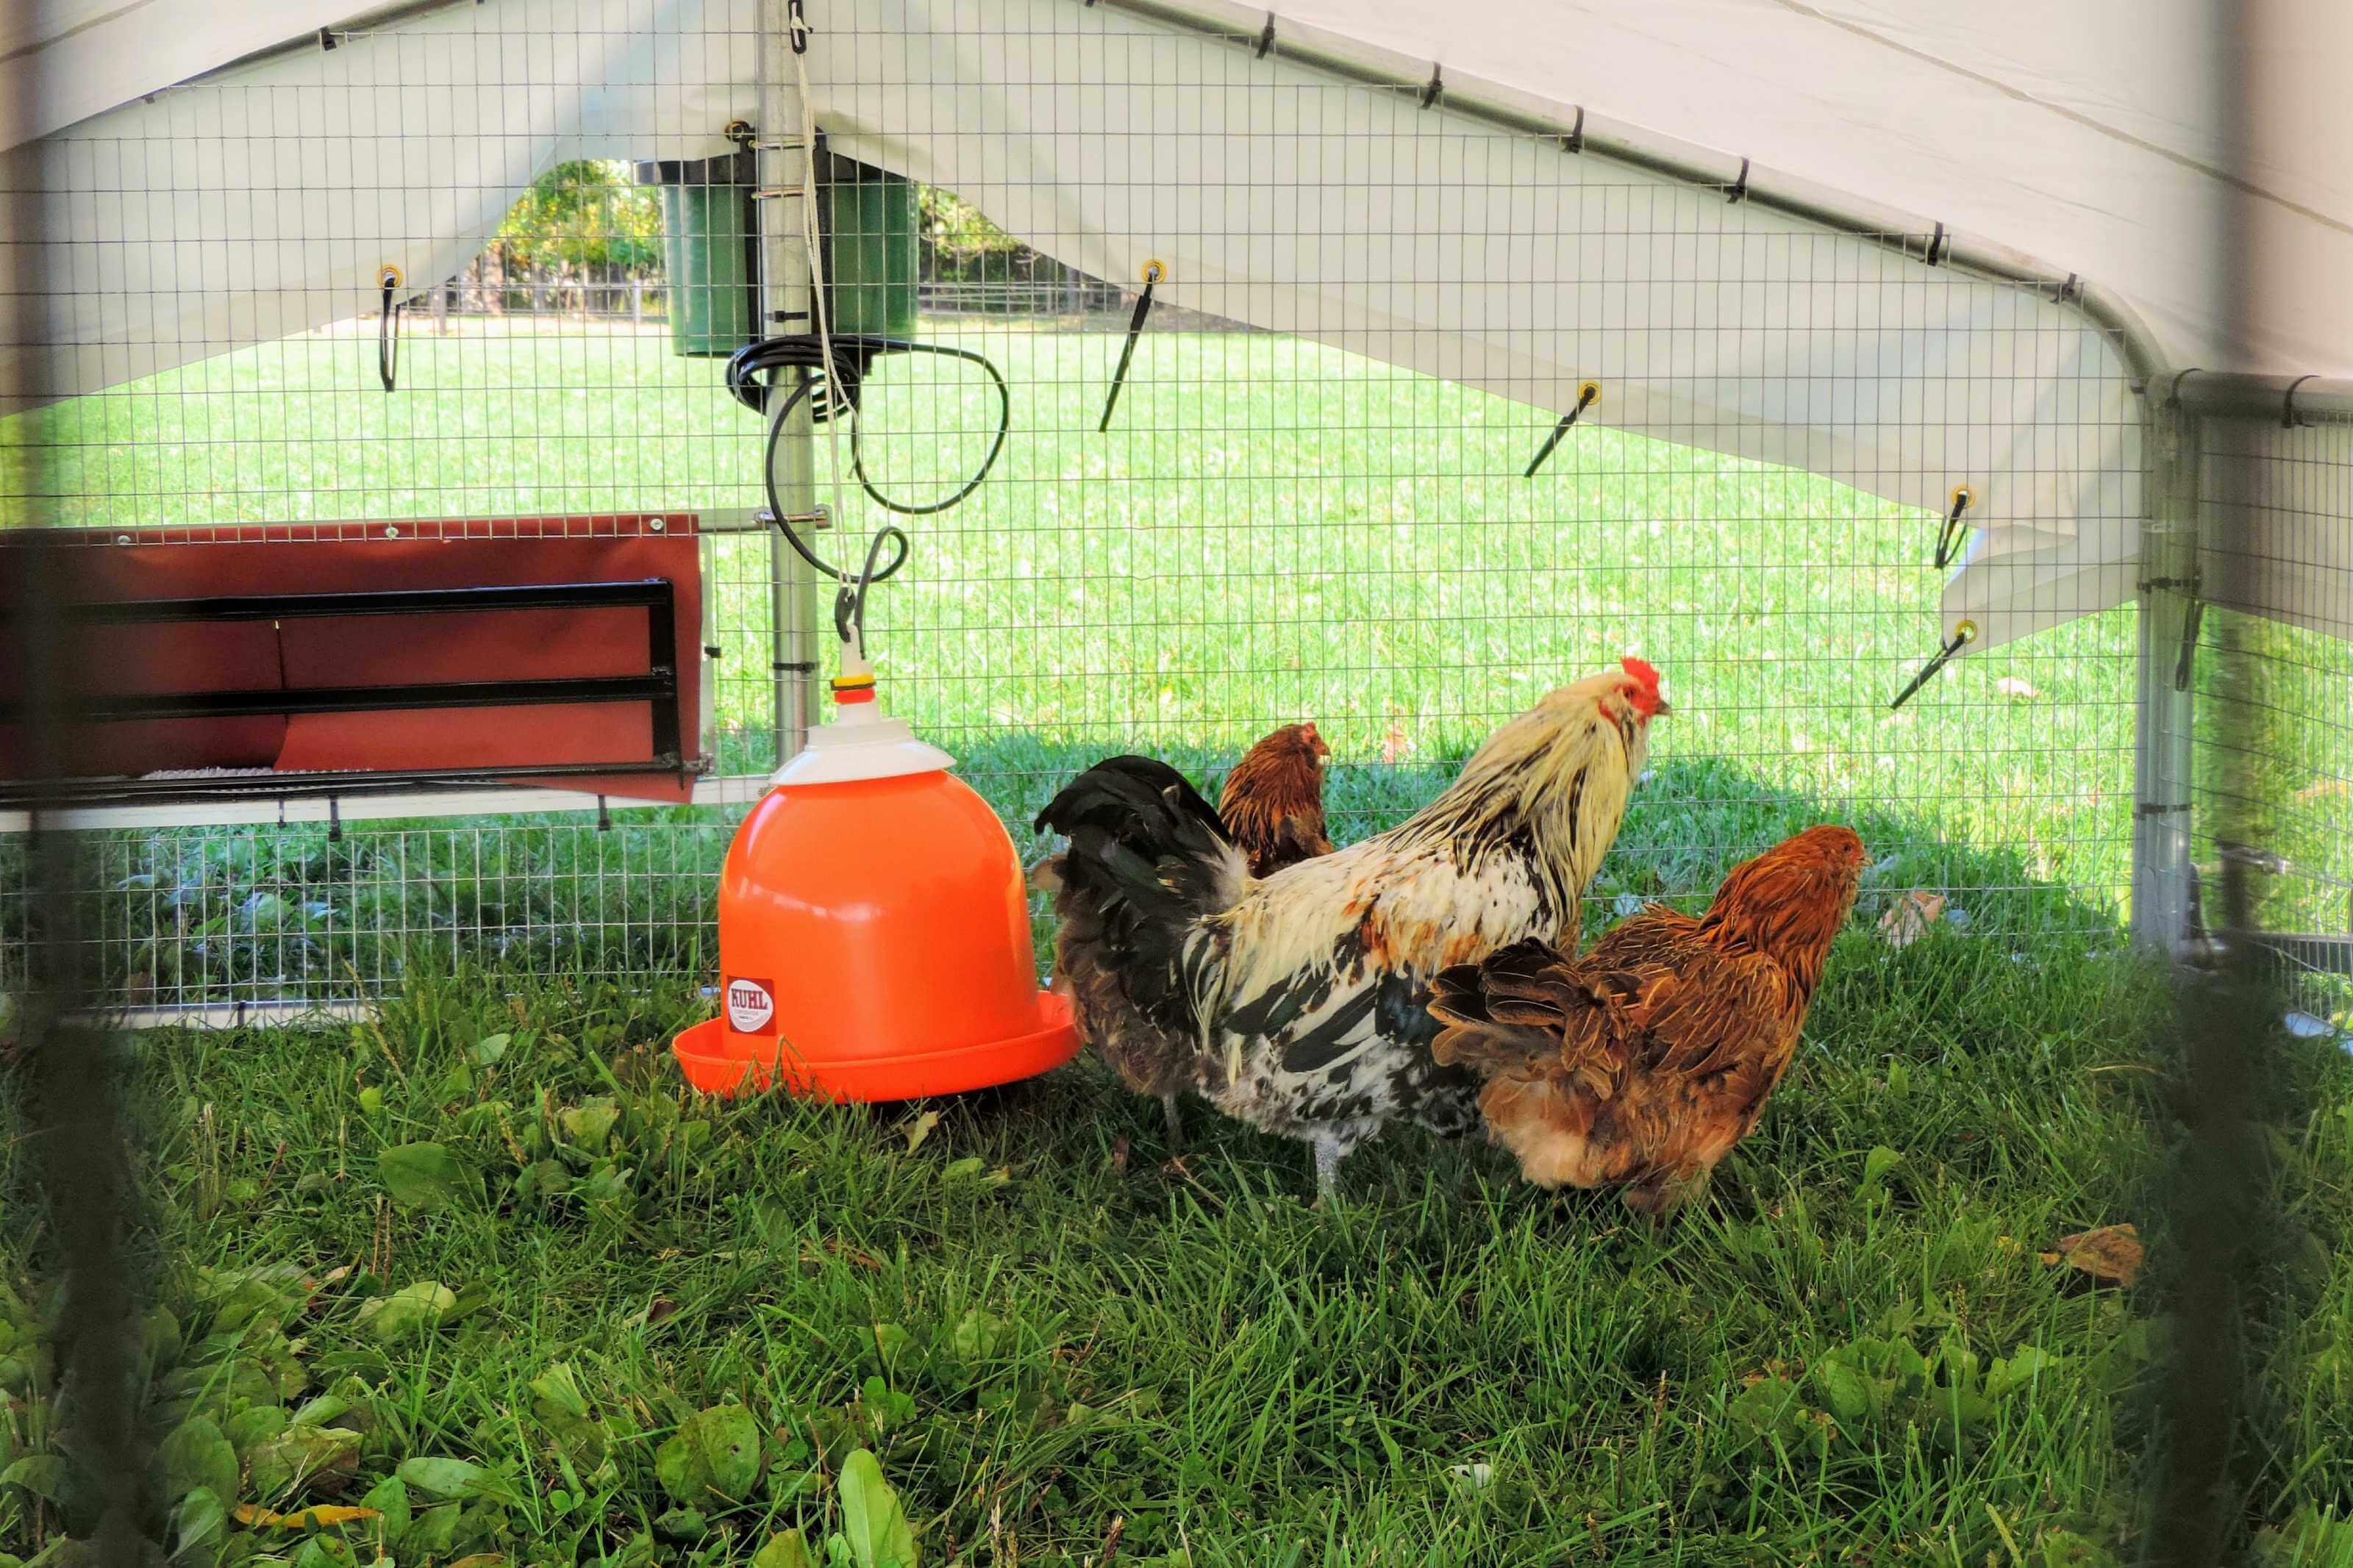 Chickens enjoying roomy chicken range coop